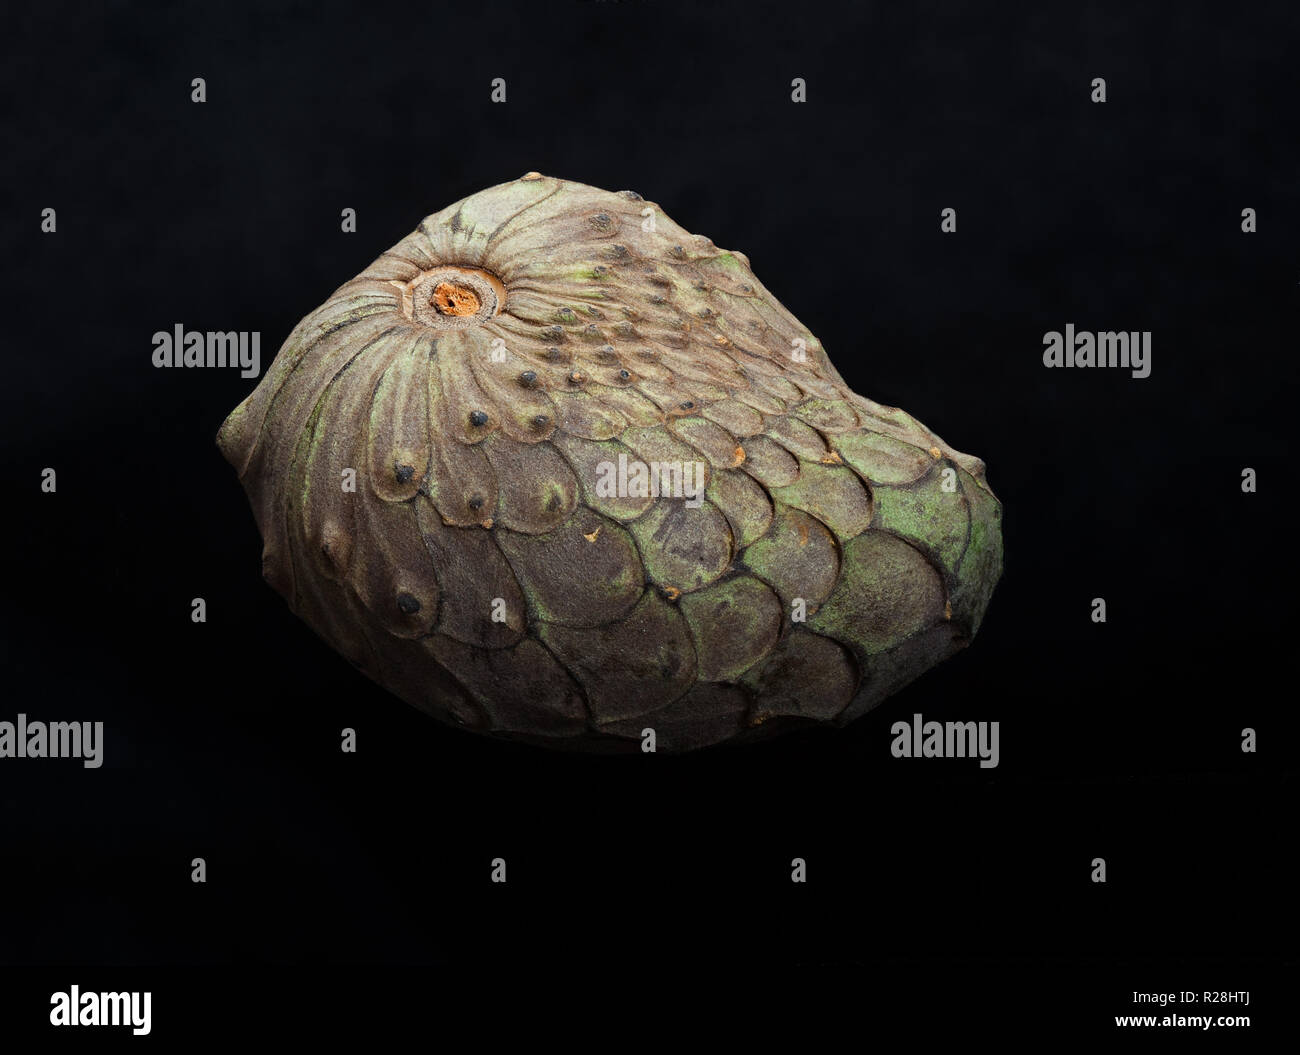 Close up of a Cherimoya fruit on a black background. - Stock Image